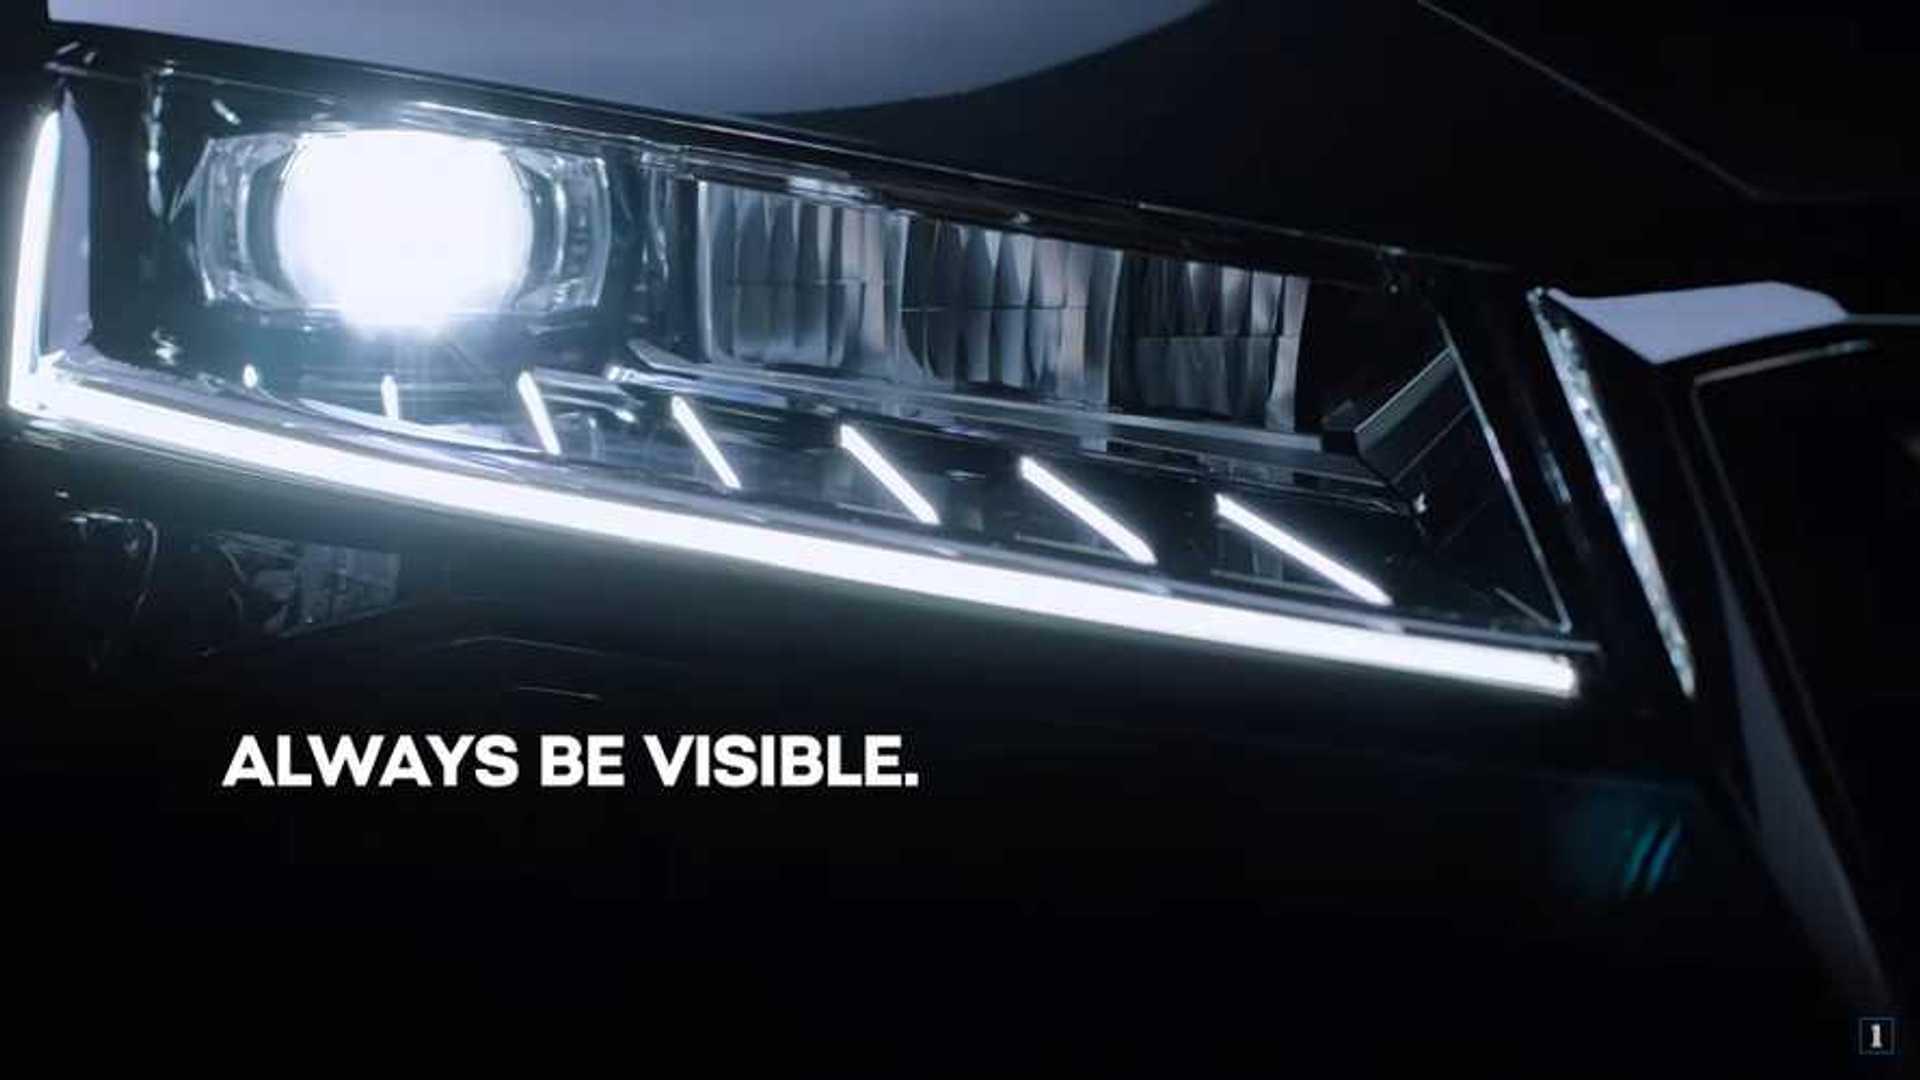 Best Led Headlights 2020 2020 Skoda Superb Teaser Shows Full LED Matrix Headlights